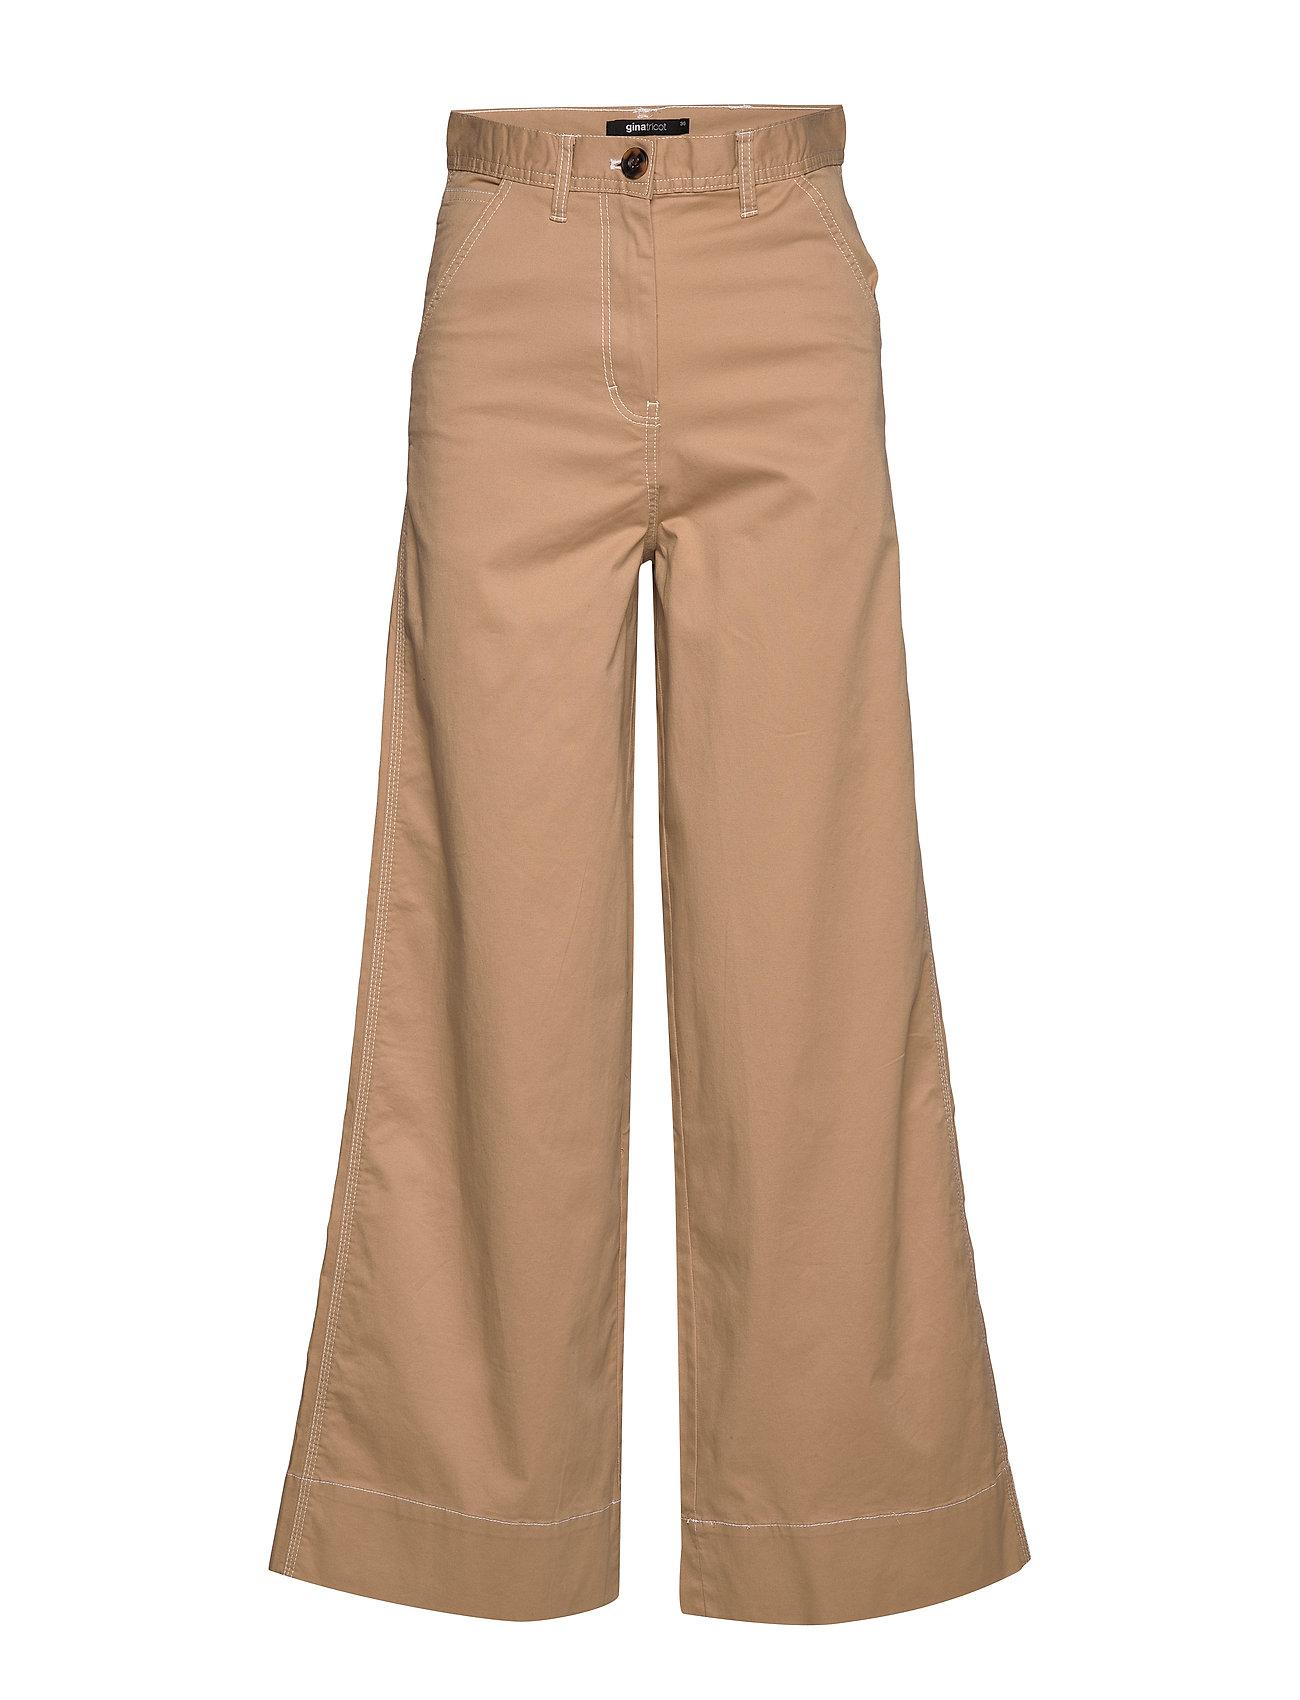 Gina Tricot Lena trousers - BEIGE